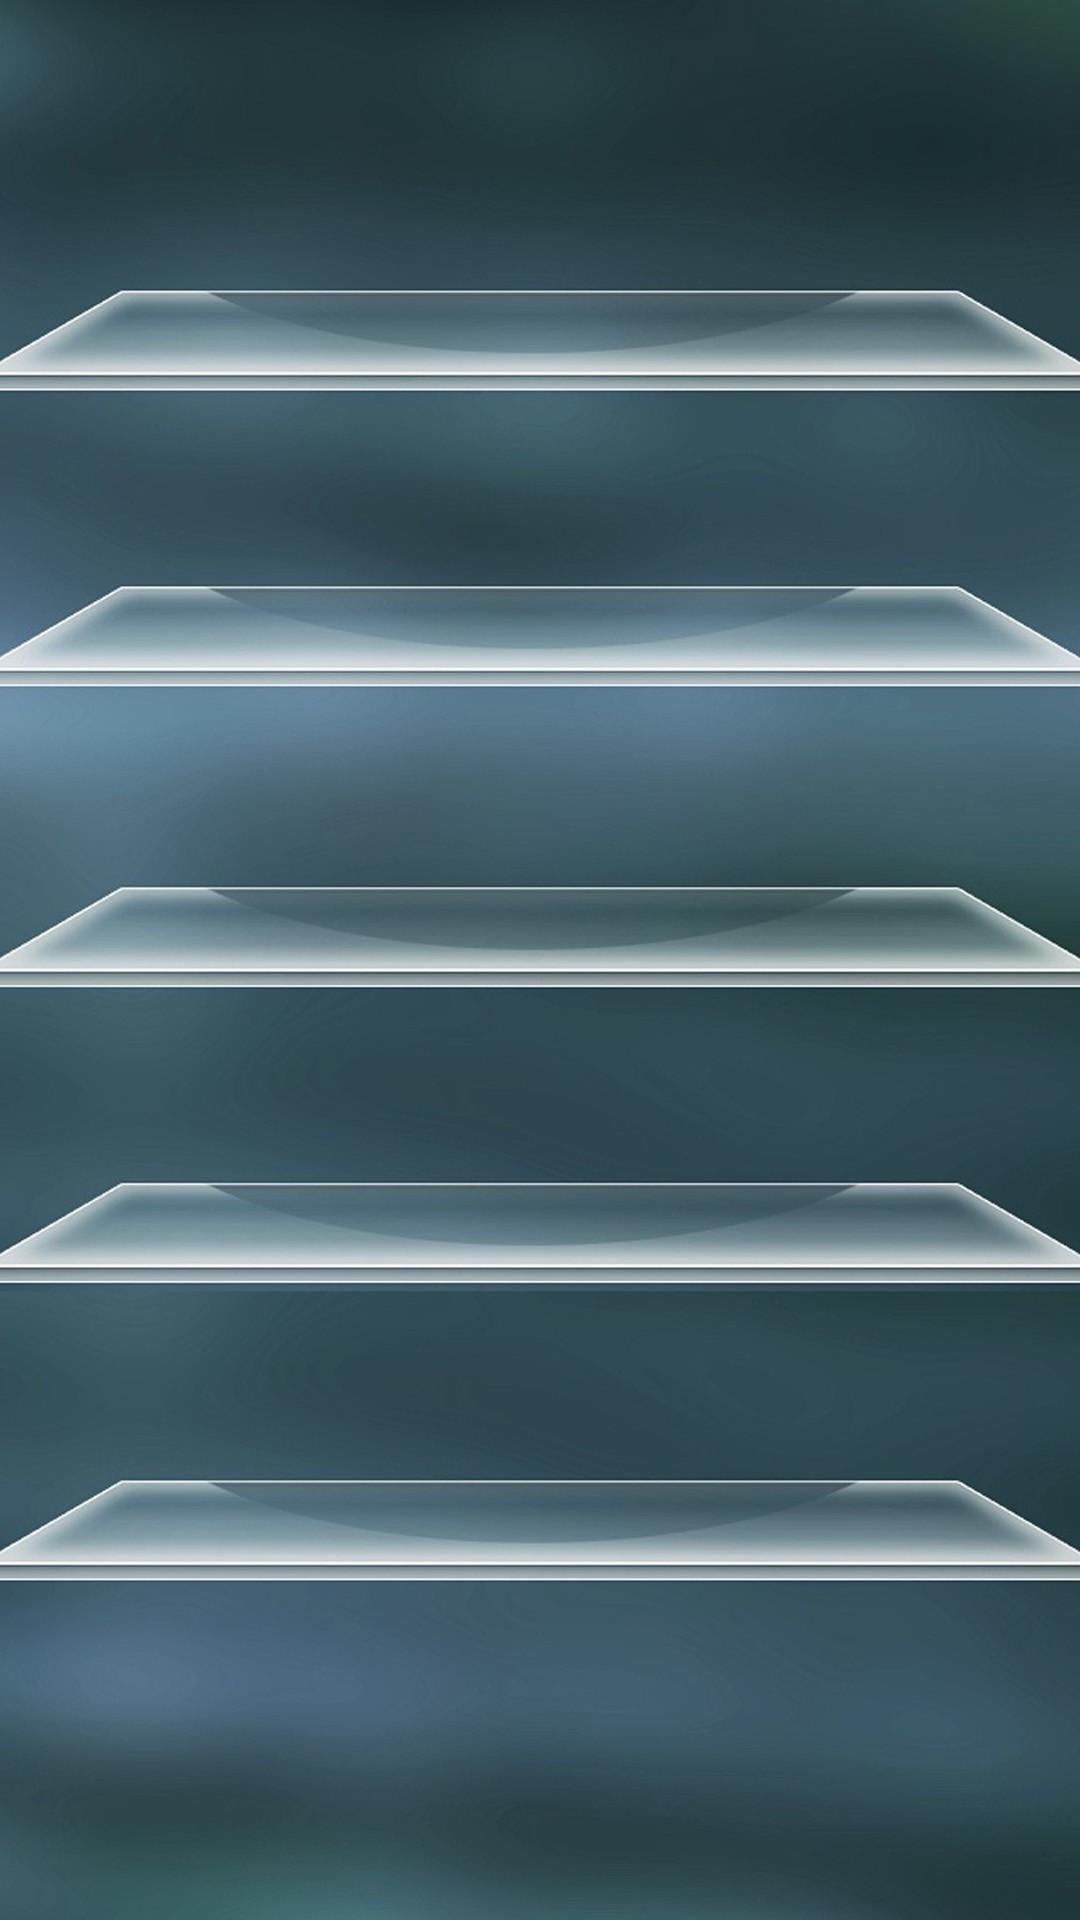 Shelf iPhone 6 Plus Wallpaper 87 | iPhone 6 Plus Wallpapers HD